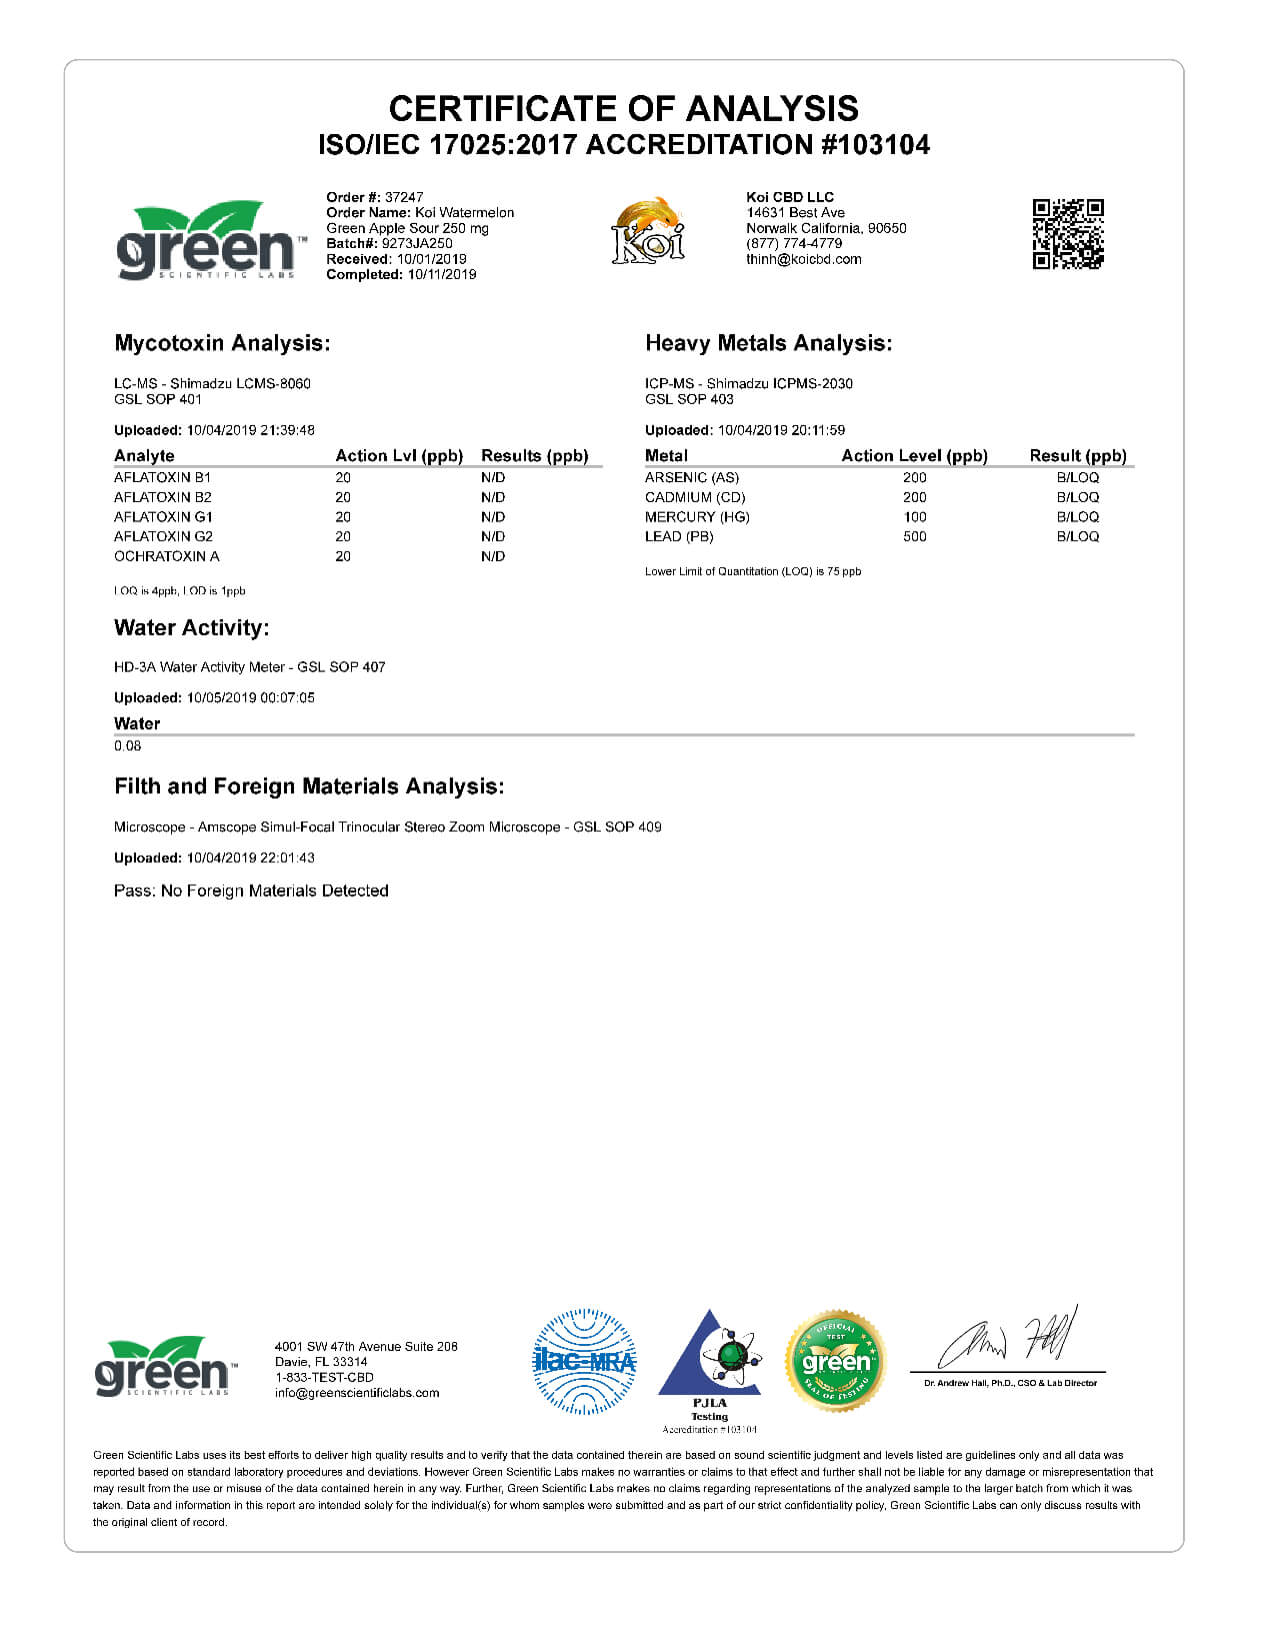 Koi CBD Watermelon Green Apple Sour Vape Oil 250mg page6